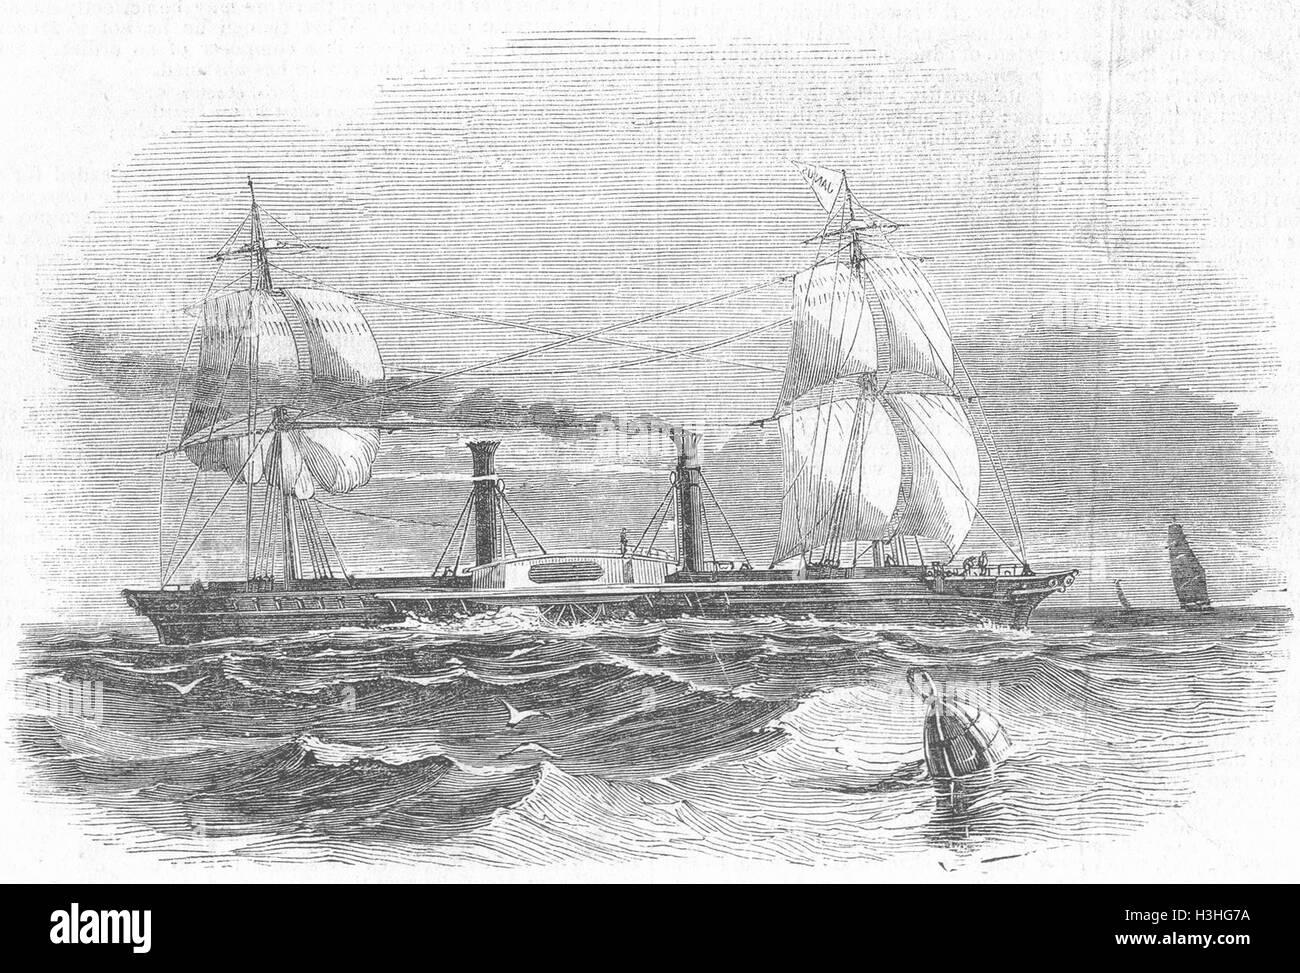 SHIPS New Govt ship Janus 1844. Illustrated London News - Stock Image